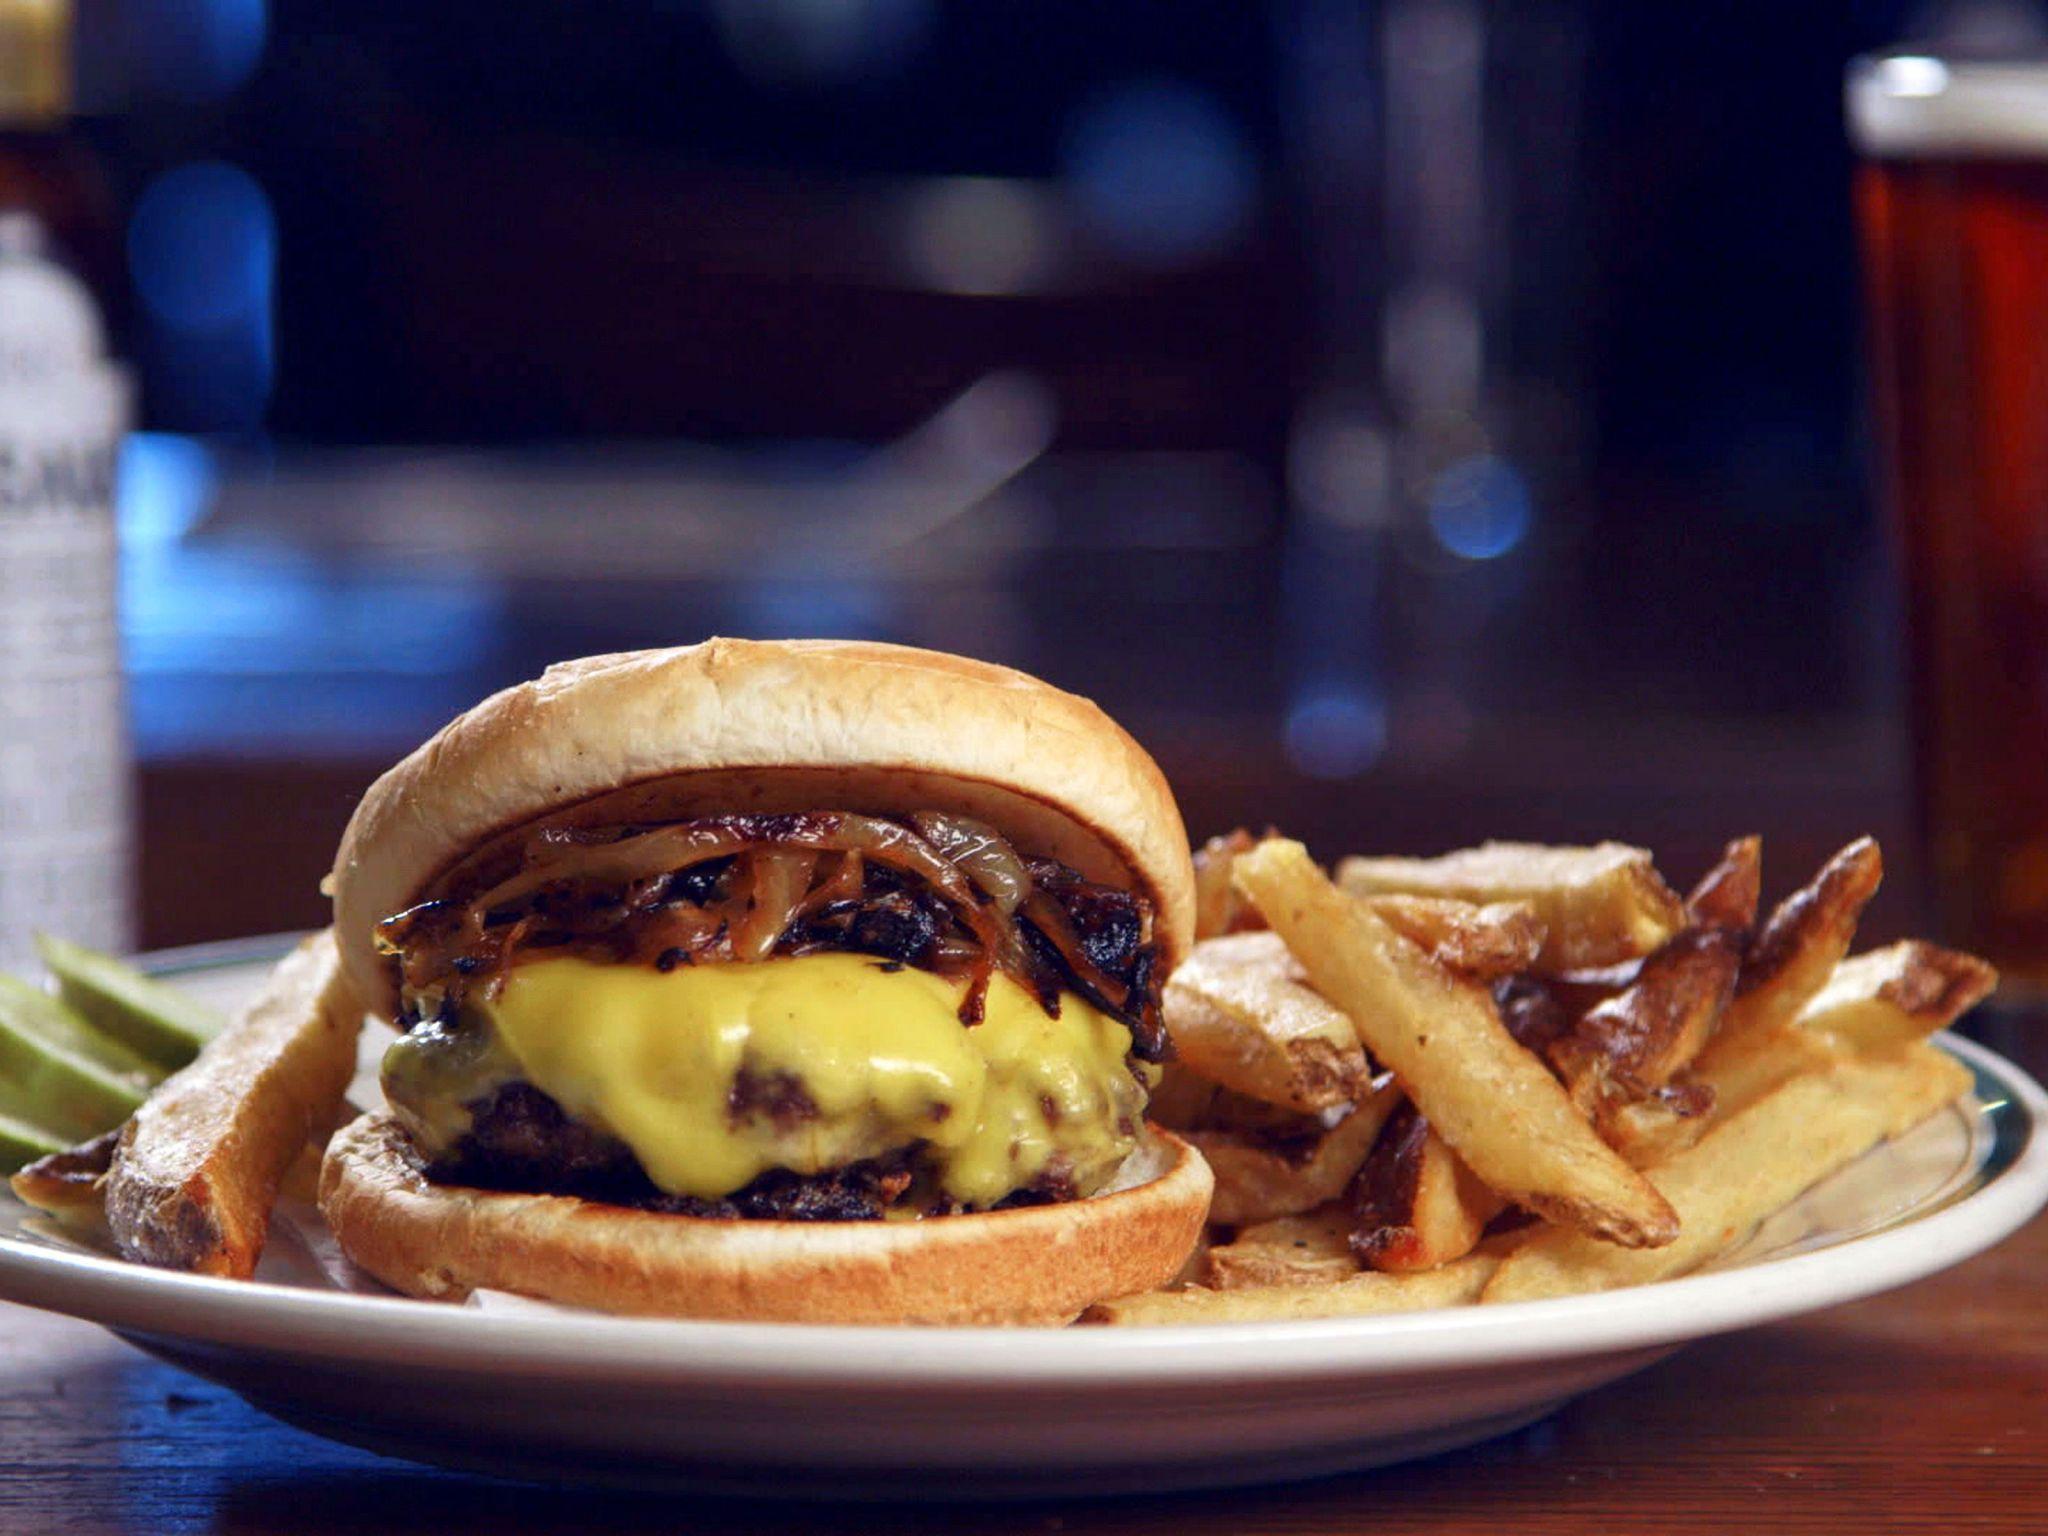 2 Steakhouse Burger Brindle Room Food Network Food Network Recipes Steakhouse Burger Food